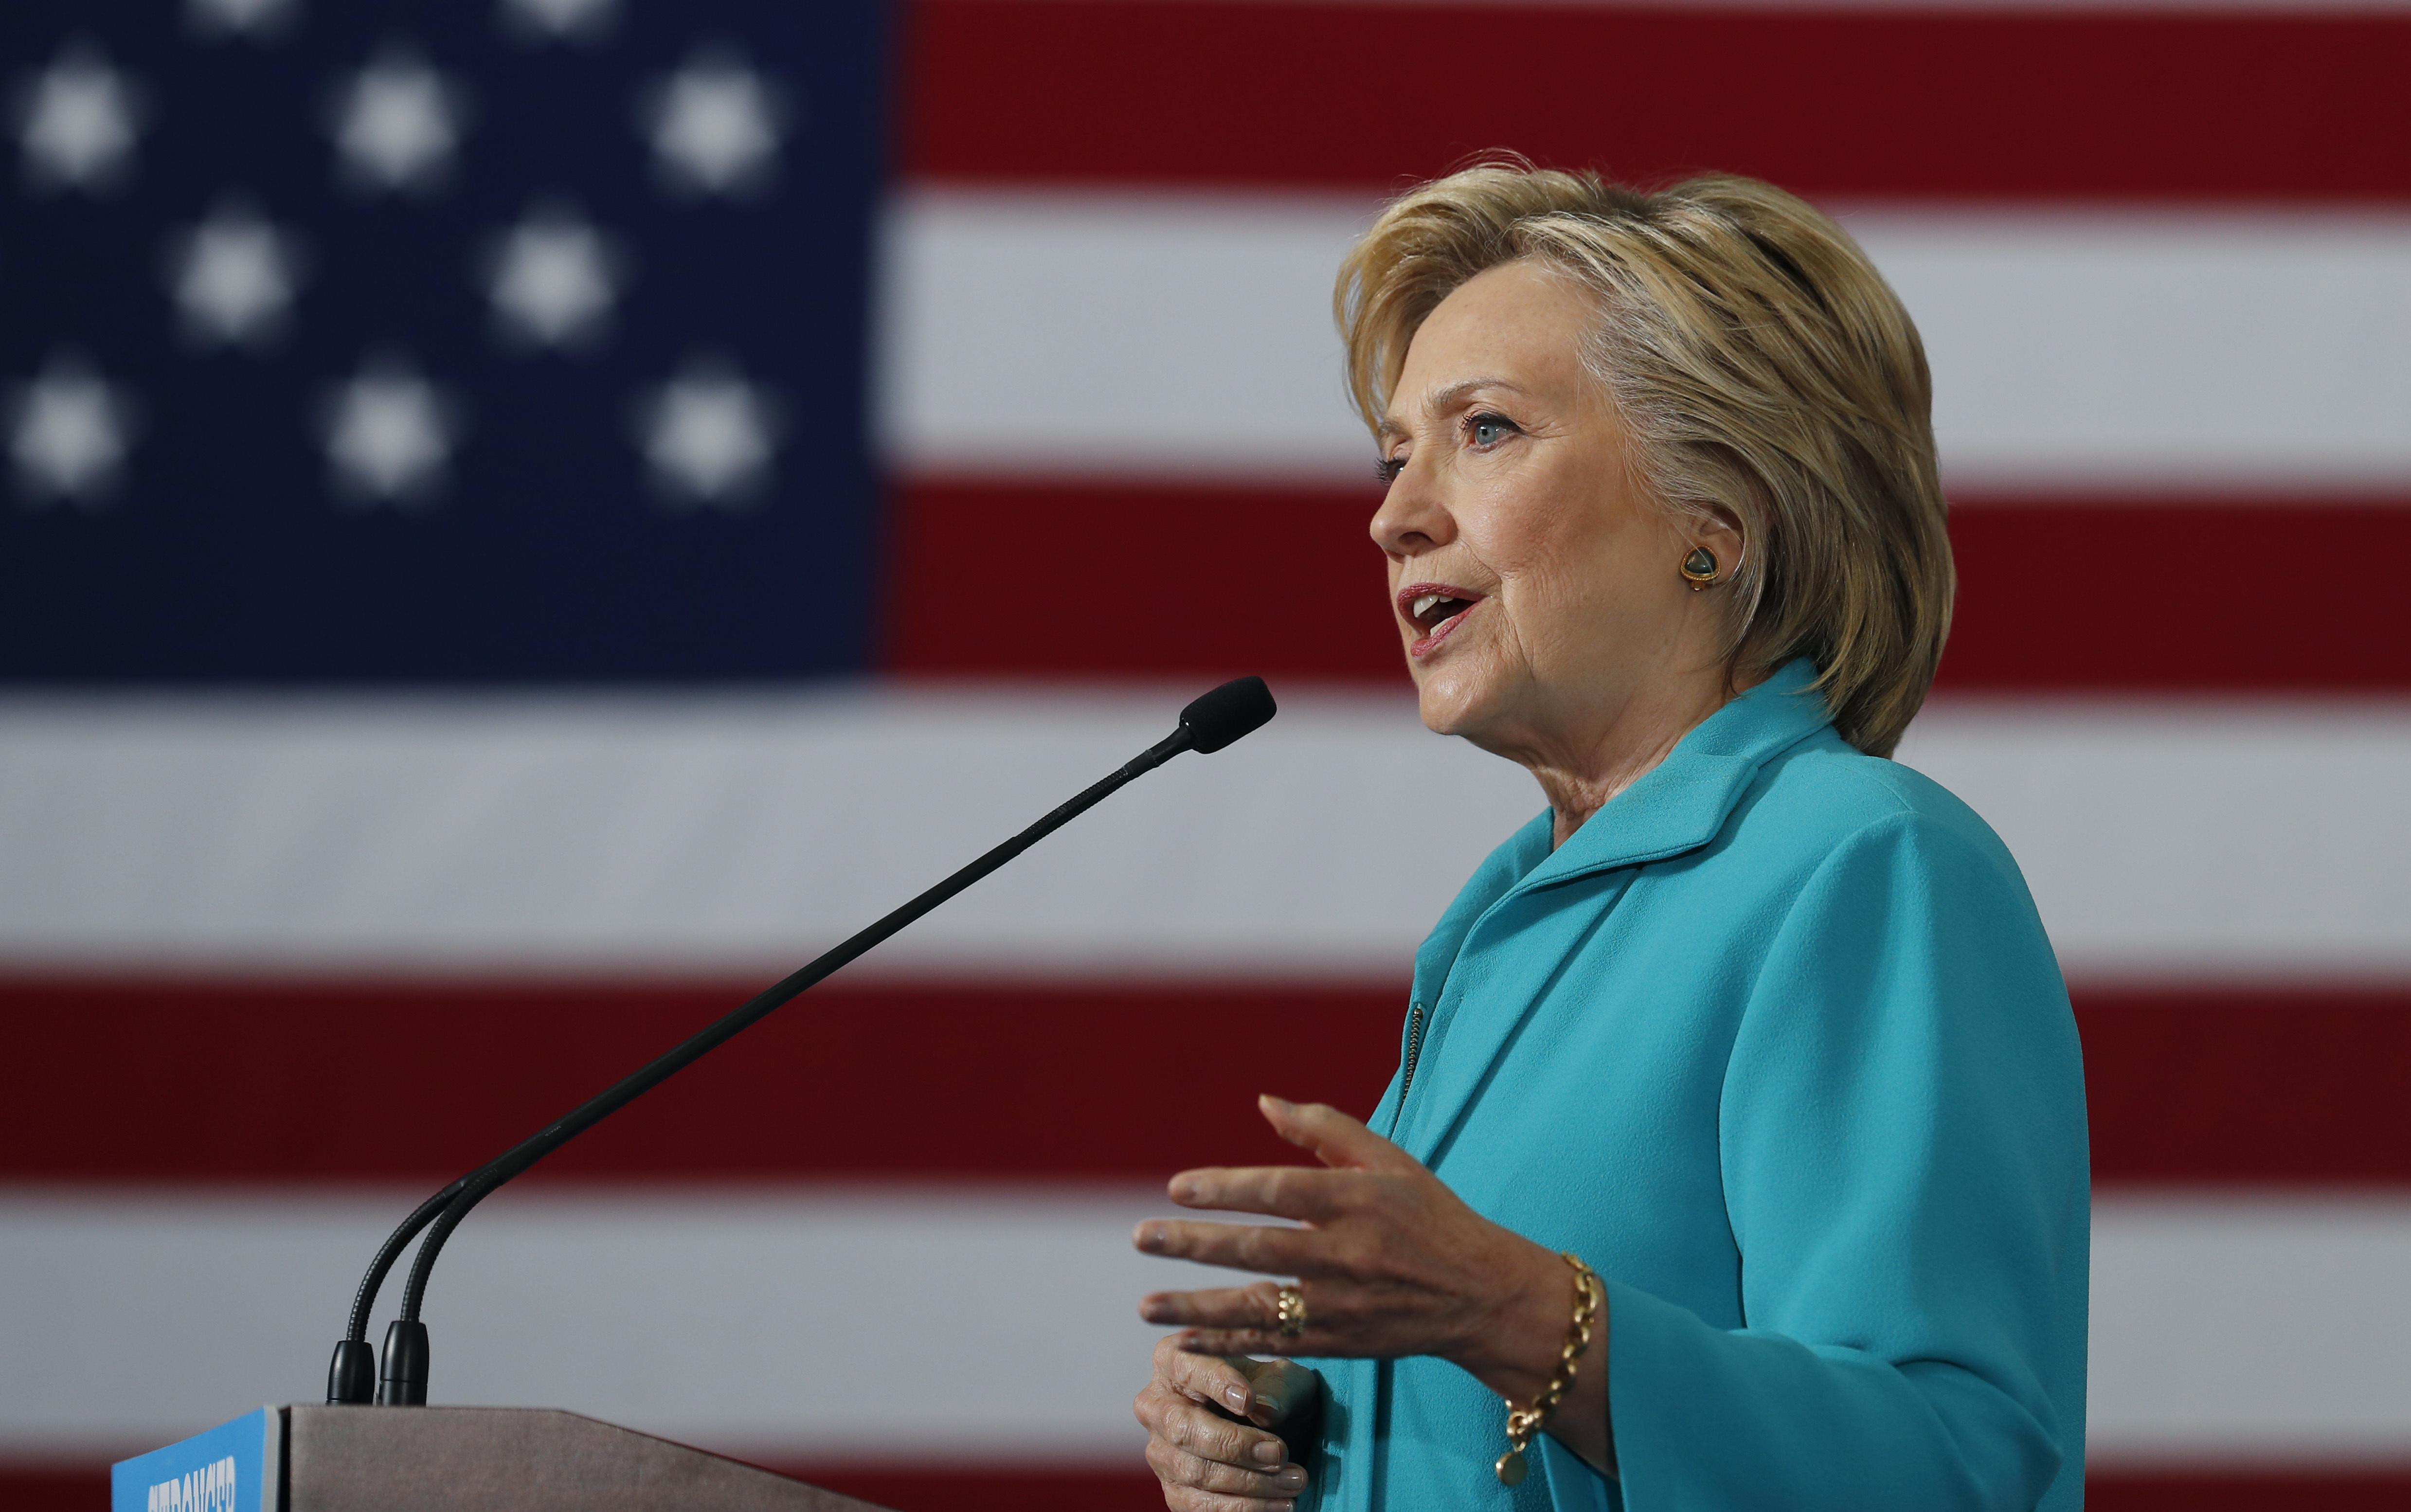 Ga. Immigration Activists Await Clarity from Trump, Clinton